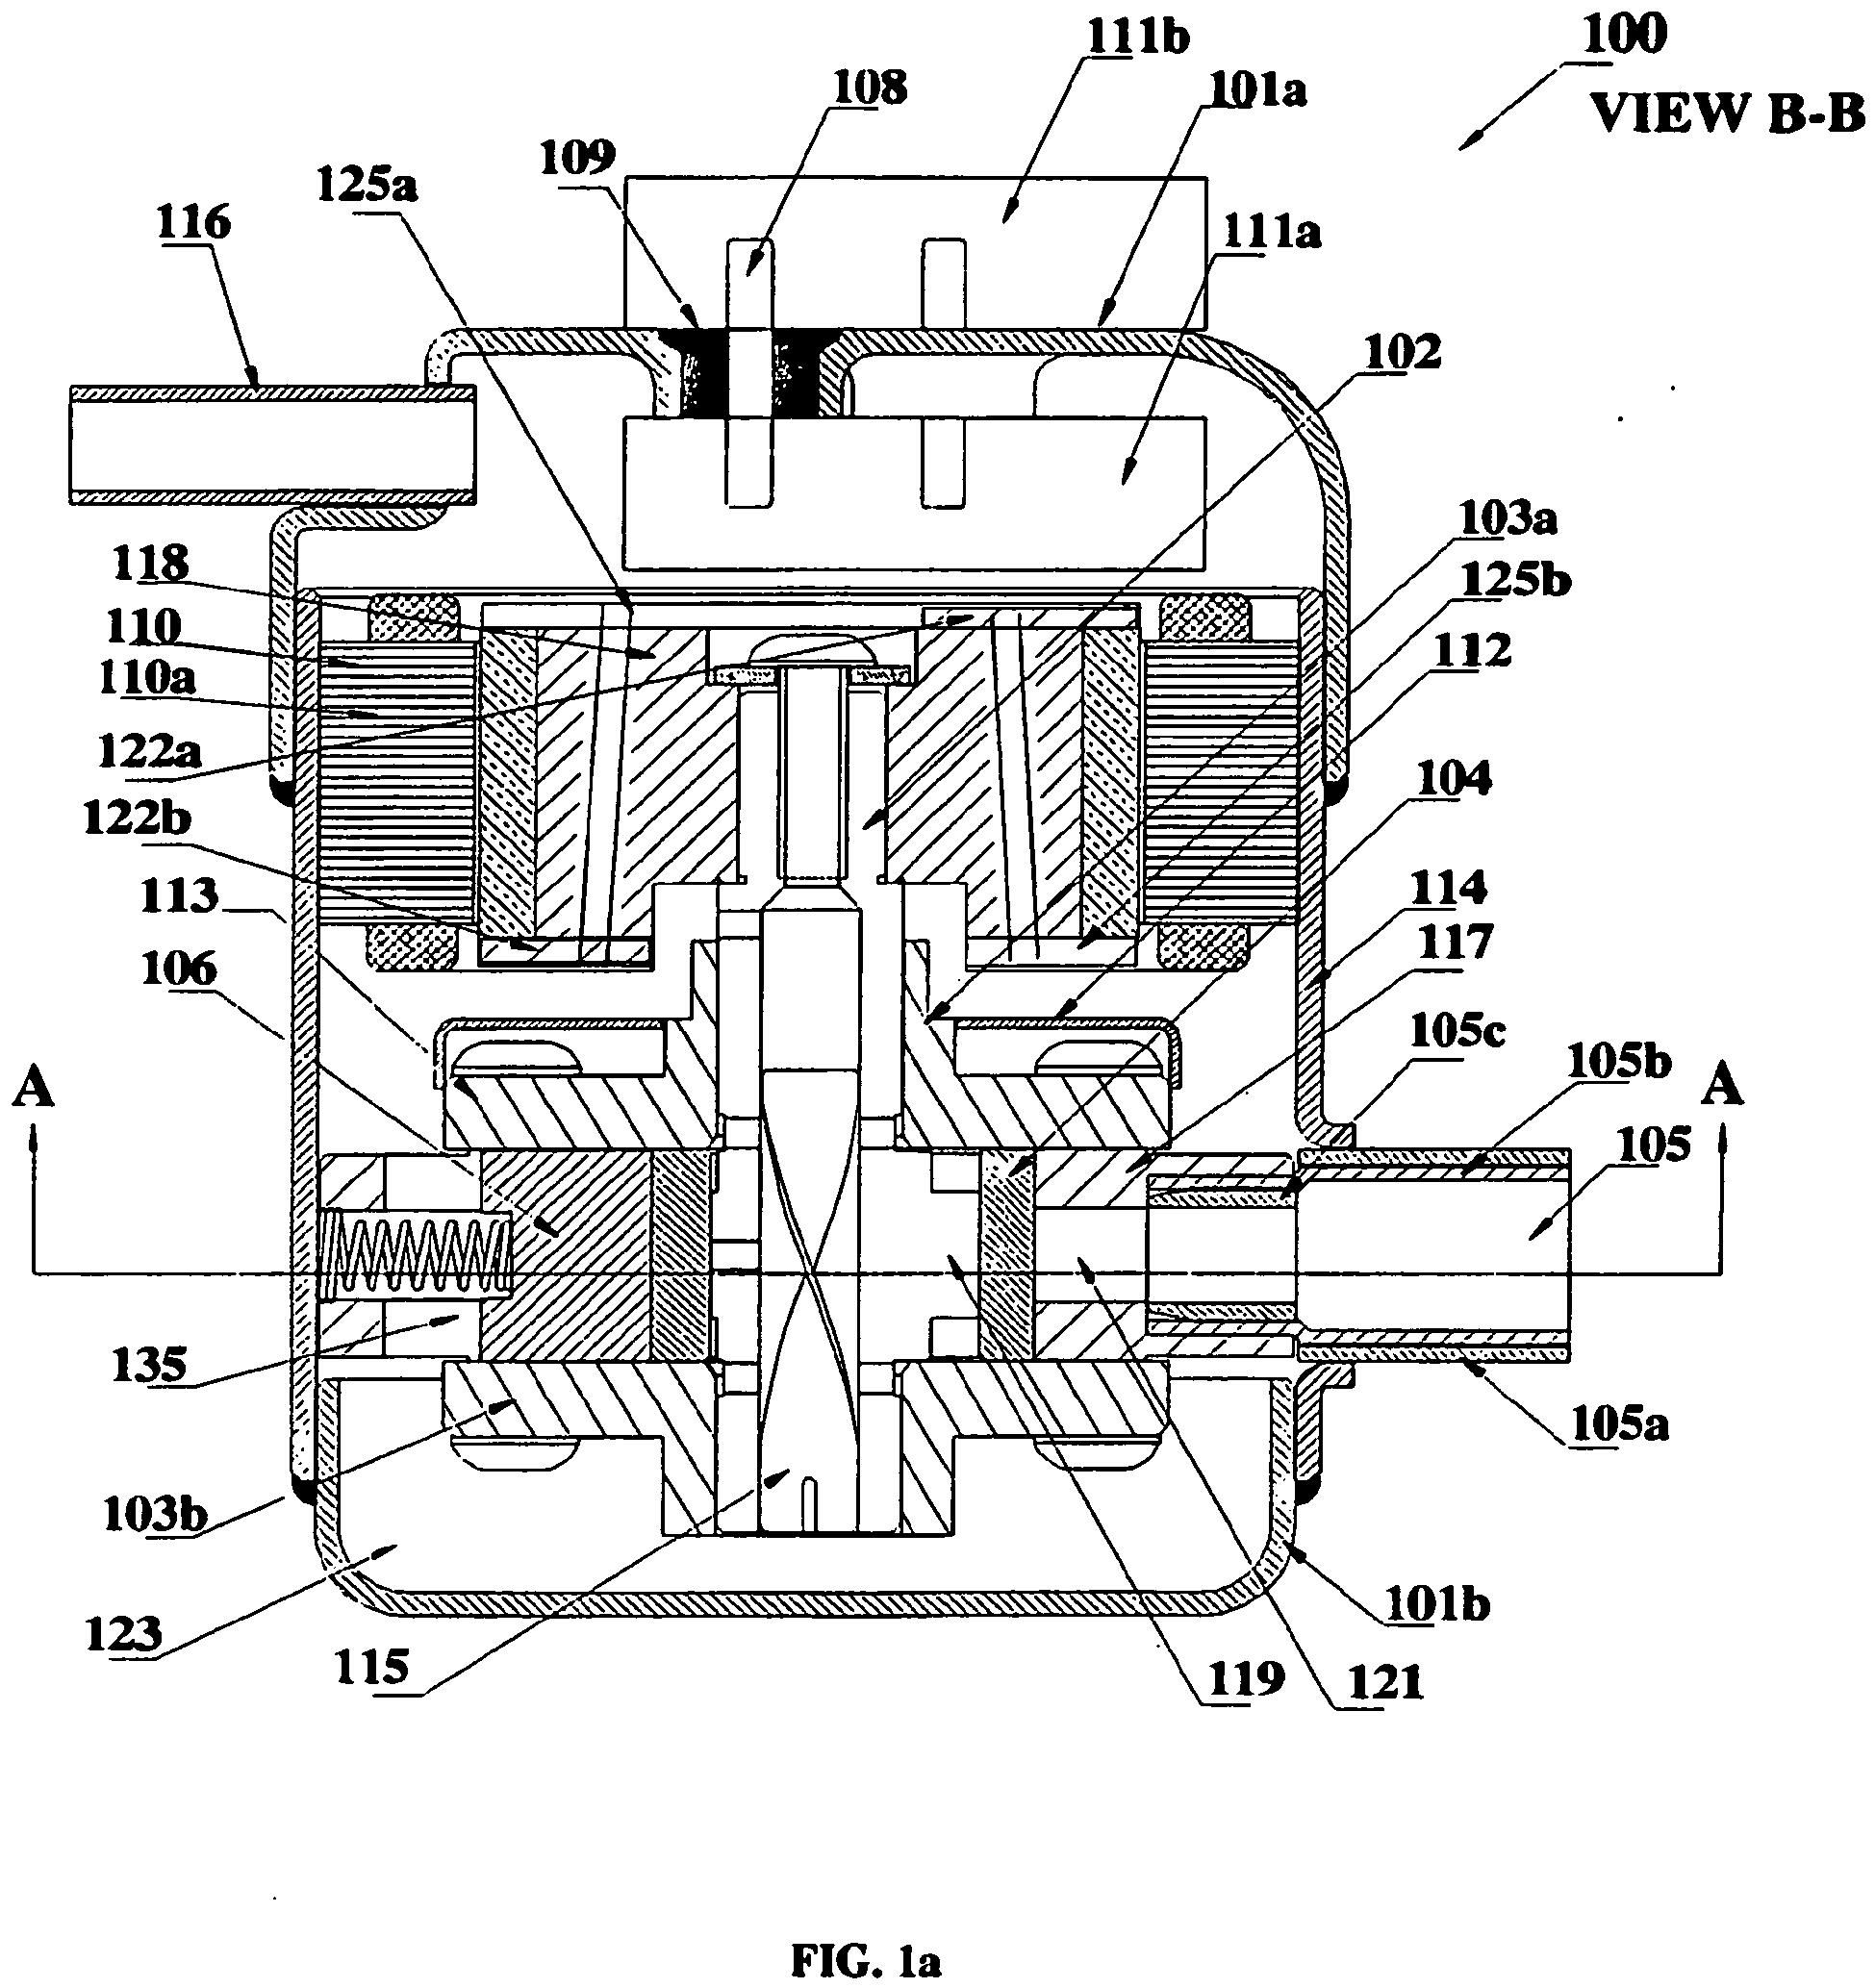 John Deere Ignition Wiring Diagram 116 John Deere 160